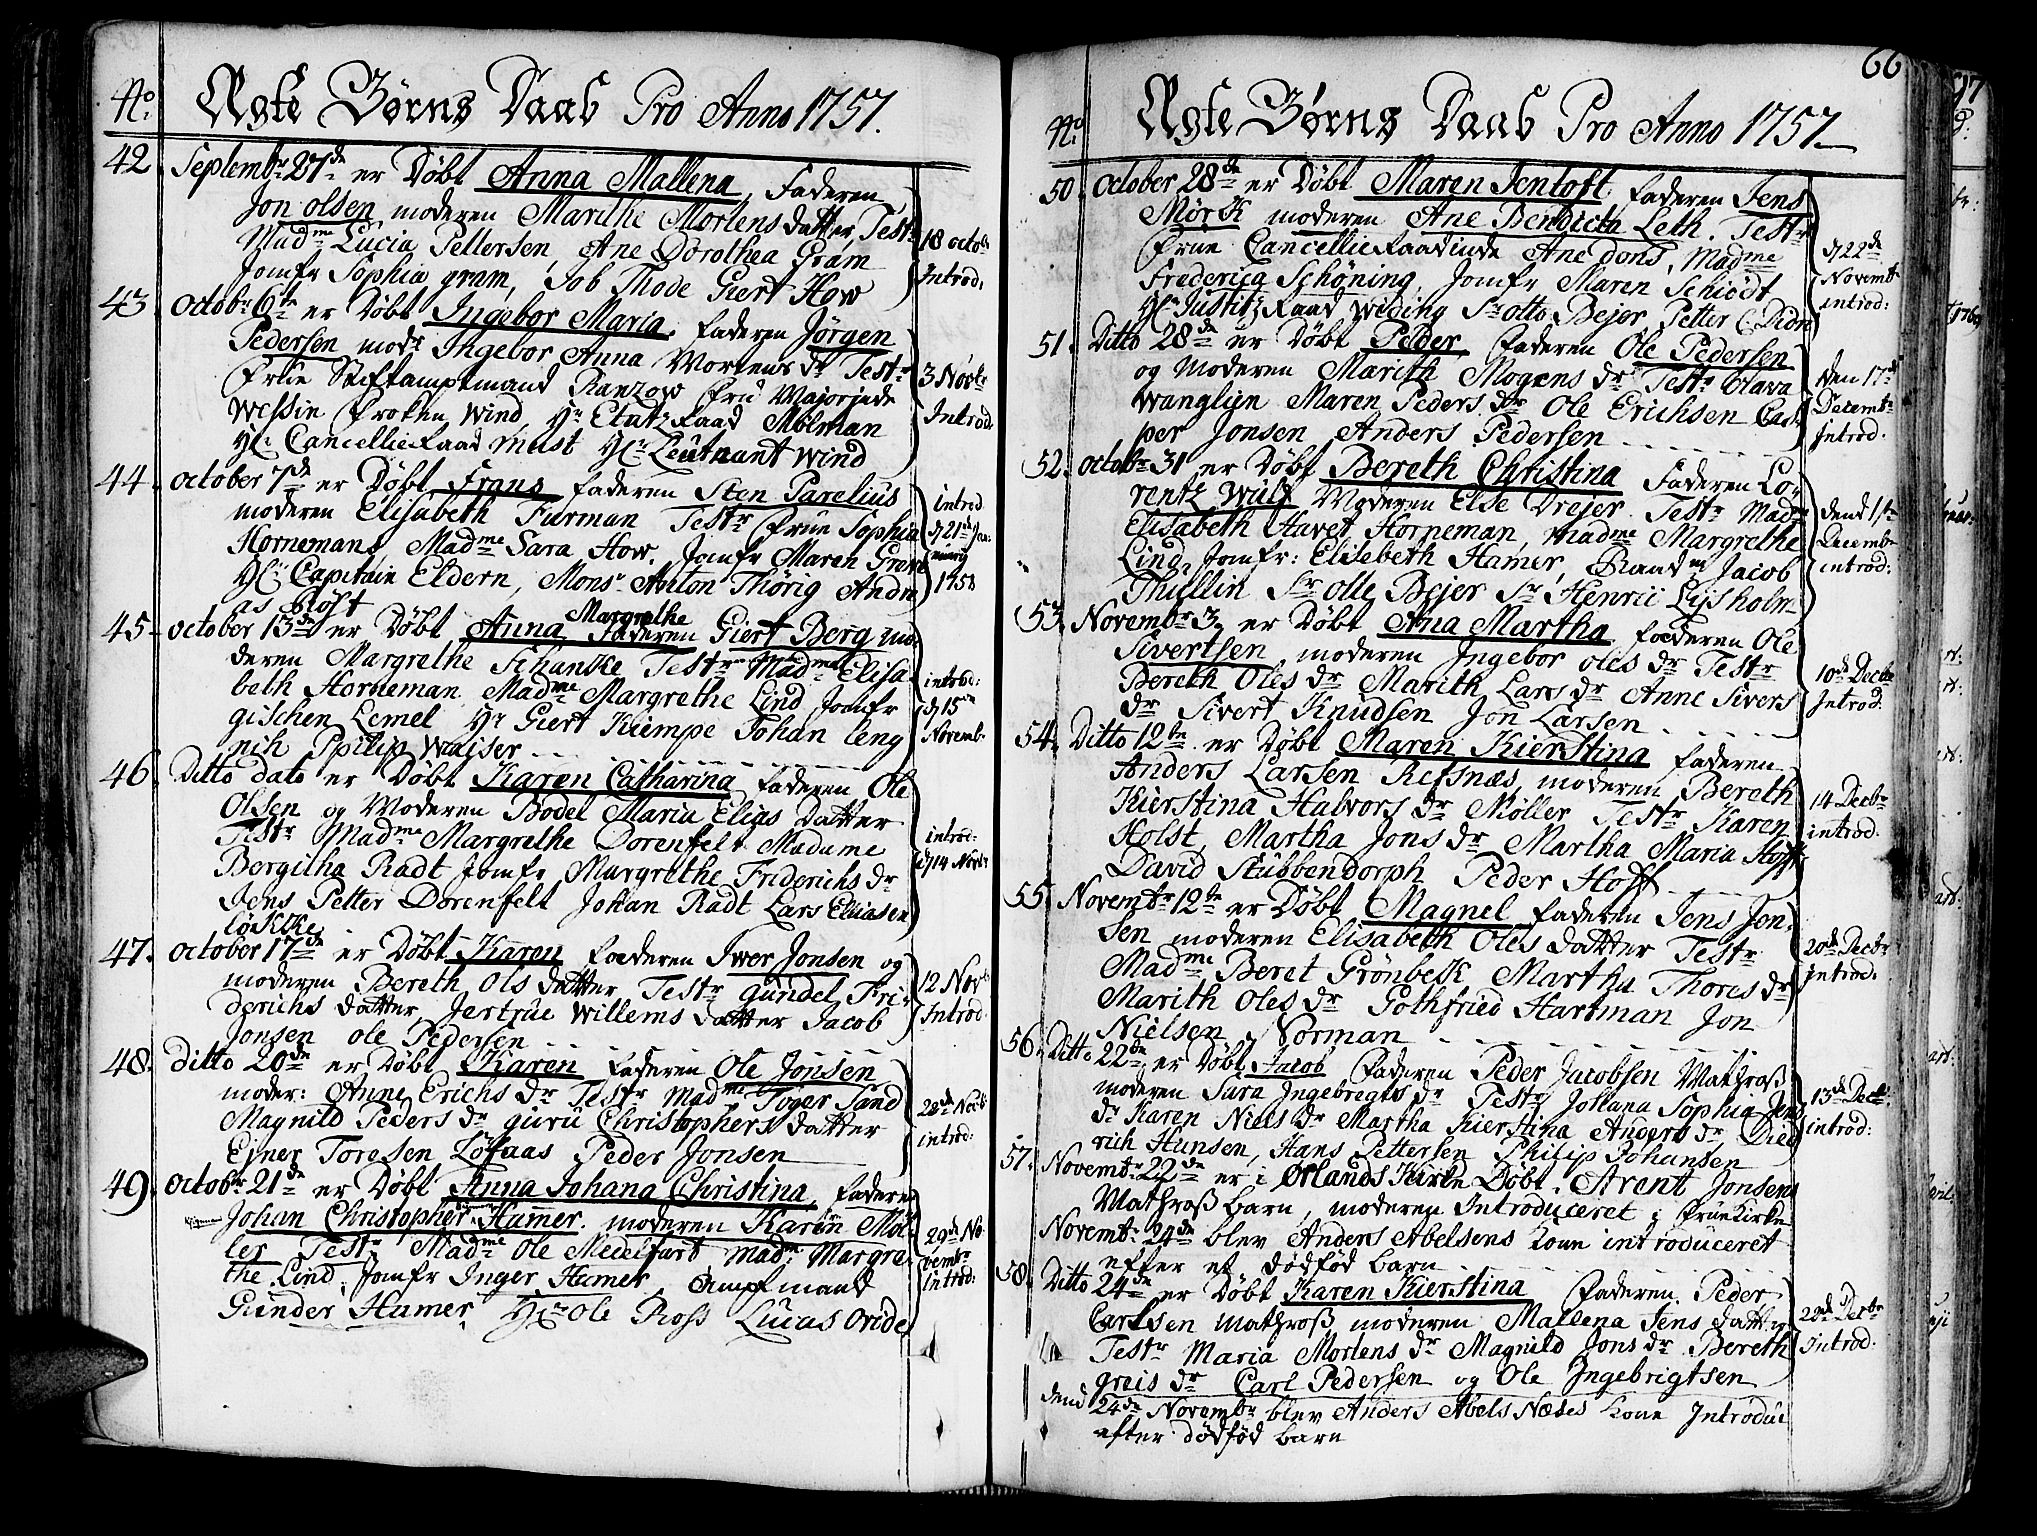 SAT, Ministerialprotokoller, klokkerbøker og fødselsregistre - Sør-Trøndelag, 602/L0103: Parish register (official) no. 602A01, 1732-1774, p. 66